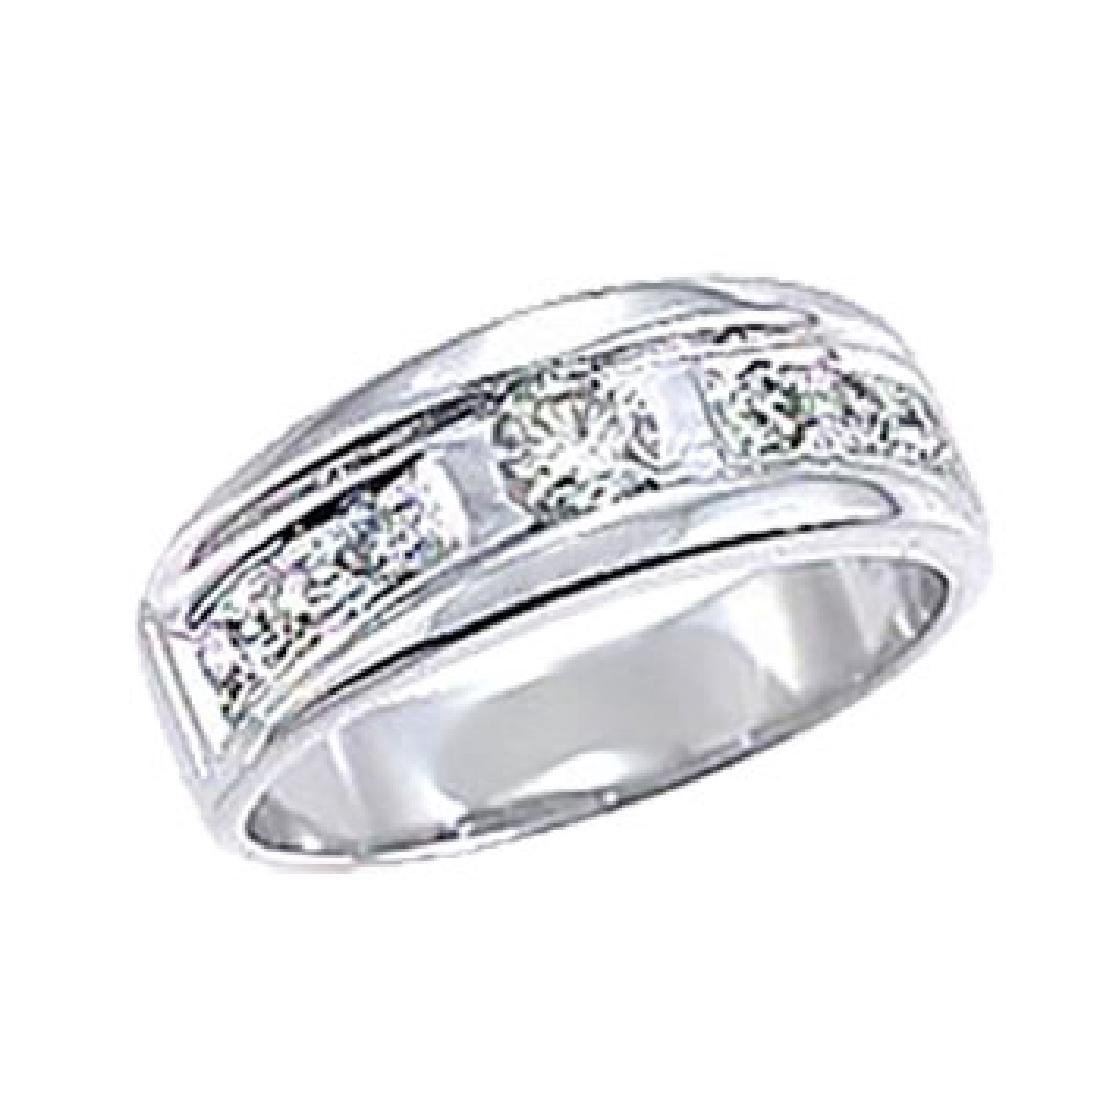 0.46 CTW Diamond Wedding Band  Ring in 14K White Gold